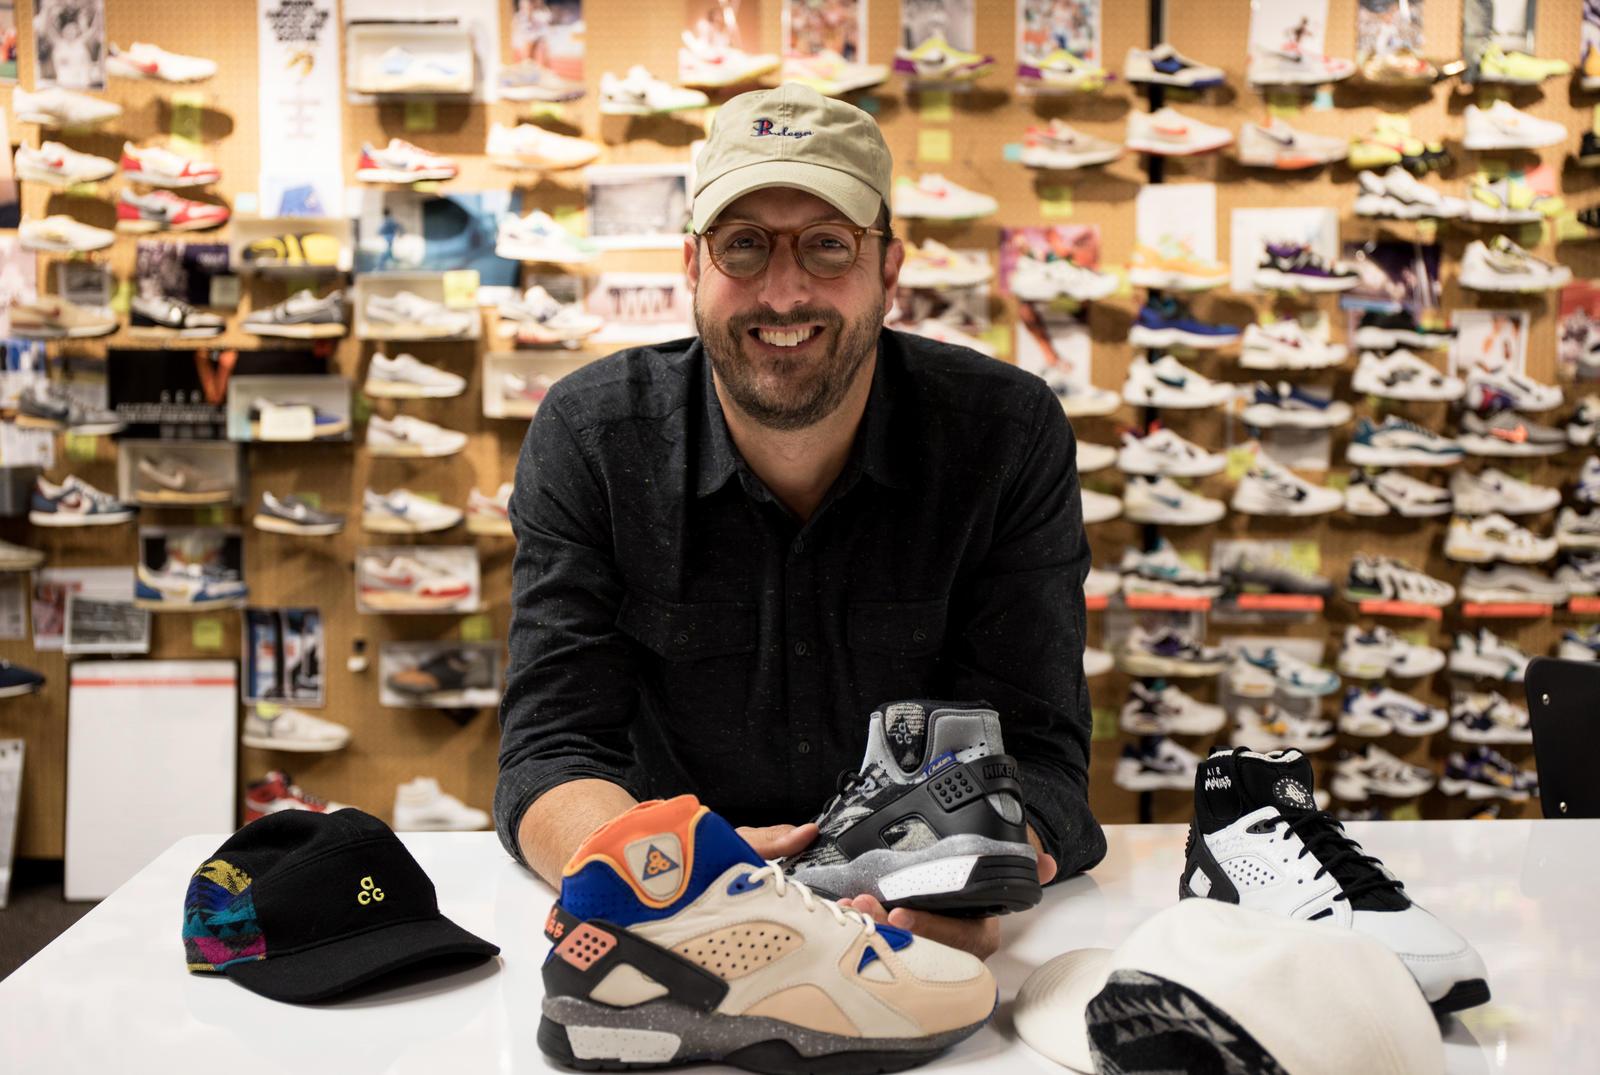 4f7f2b140dff5 Jay Gordon s Pendleton x Nike Mowabb is Future Americana - Nike News